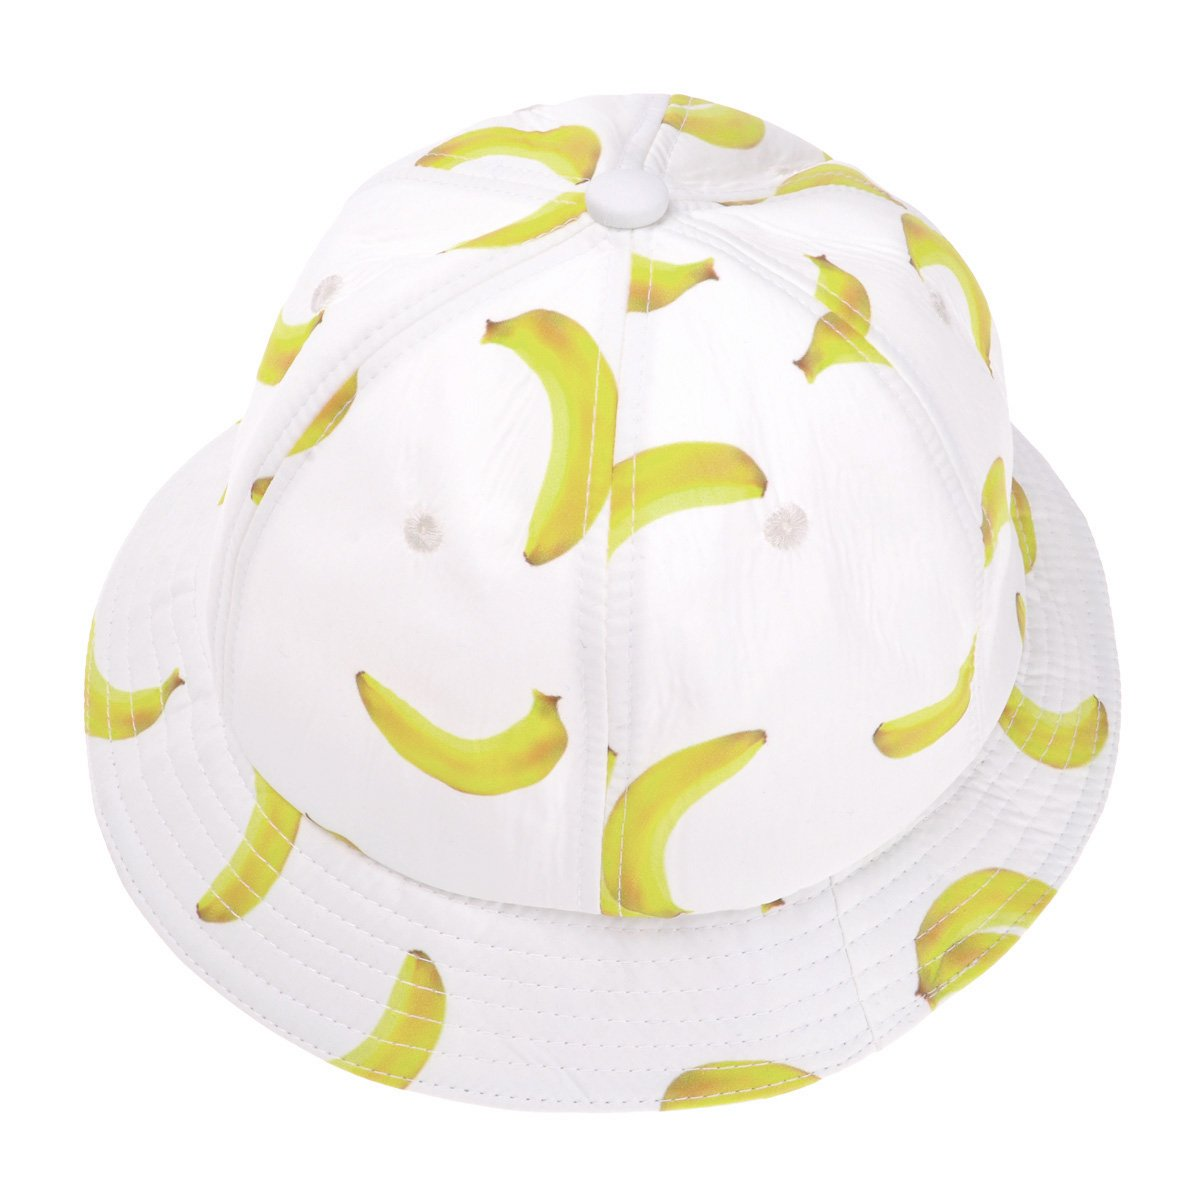 ZLYC Unisex Cute Print Bucket Hat Summer Fisherman Cap Black ZYJ-MZ-061-BK